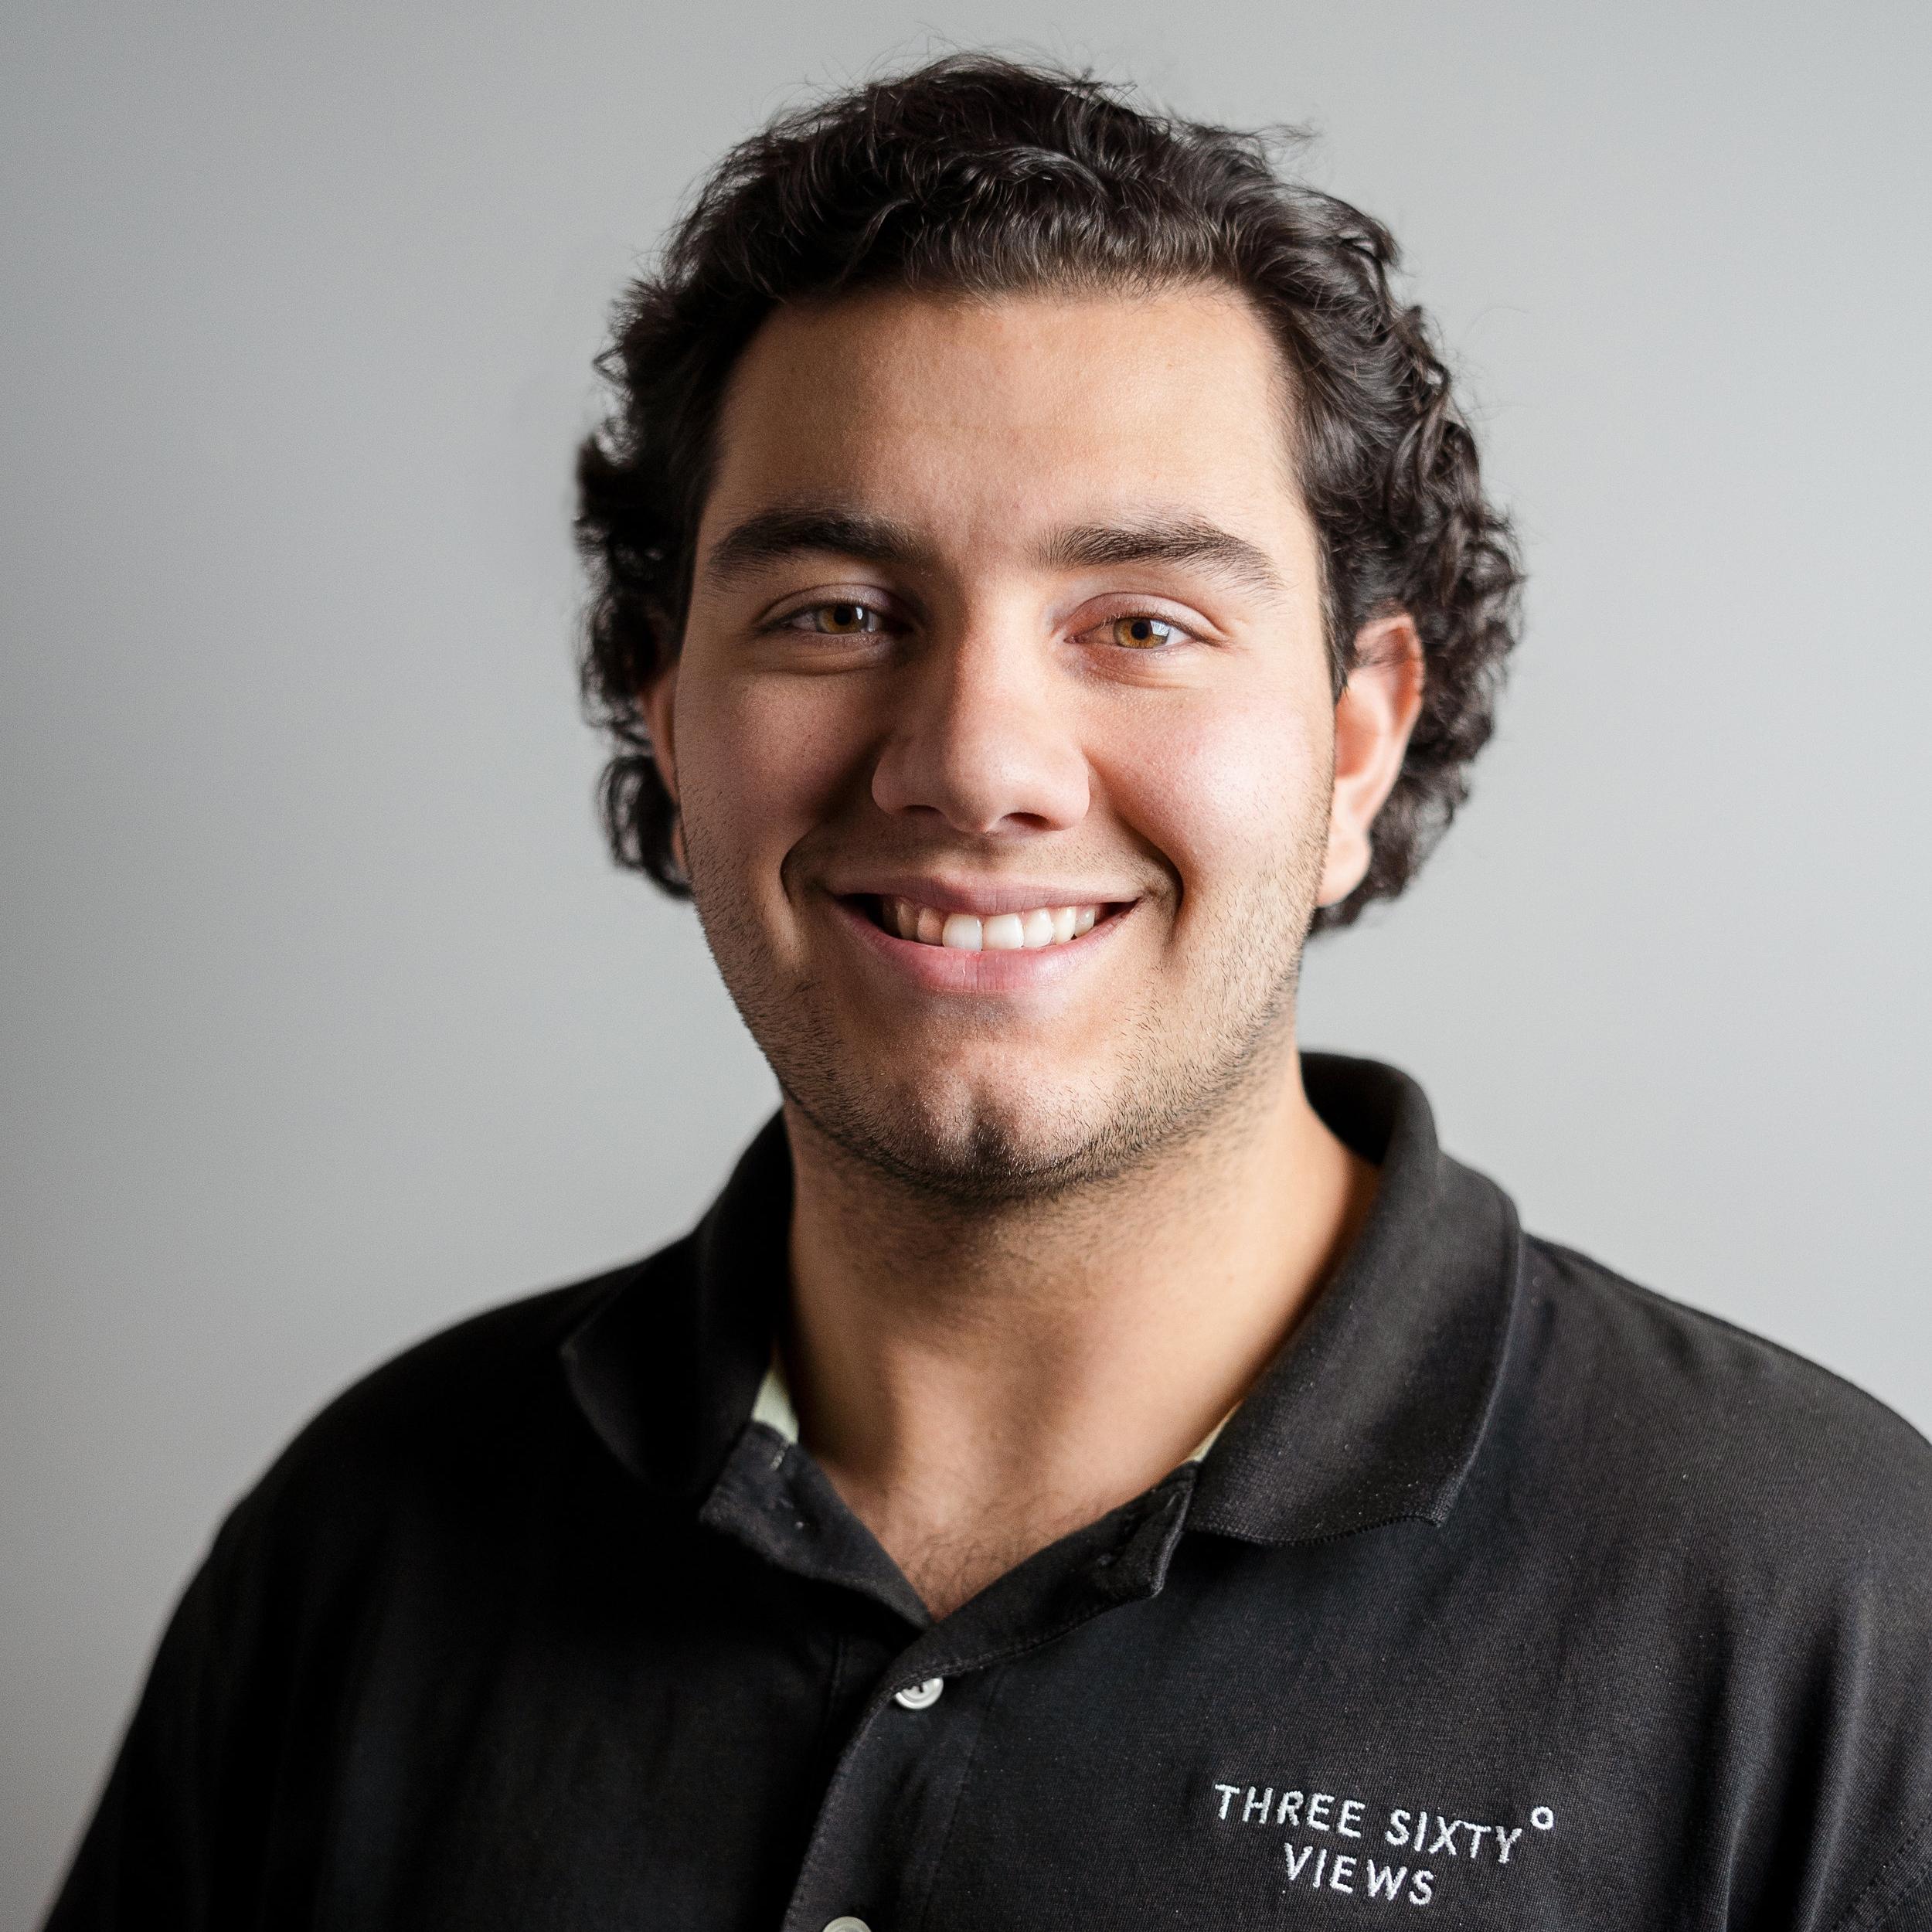 Tony Thomas - Owner / President / CEO